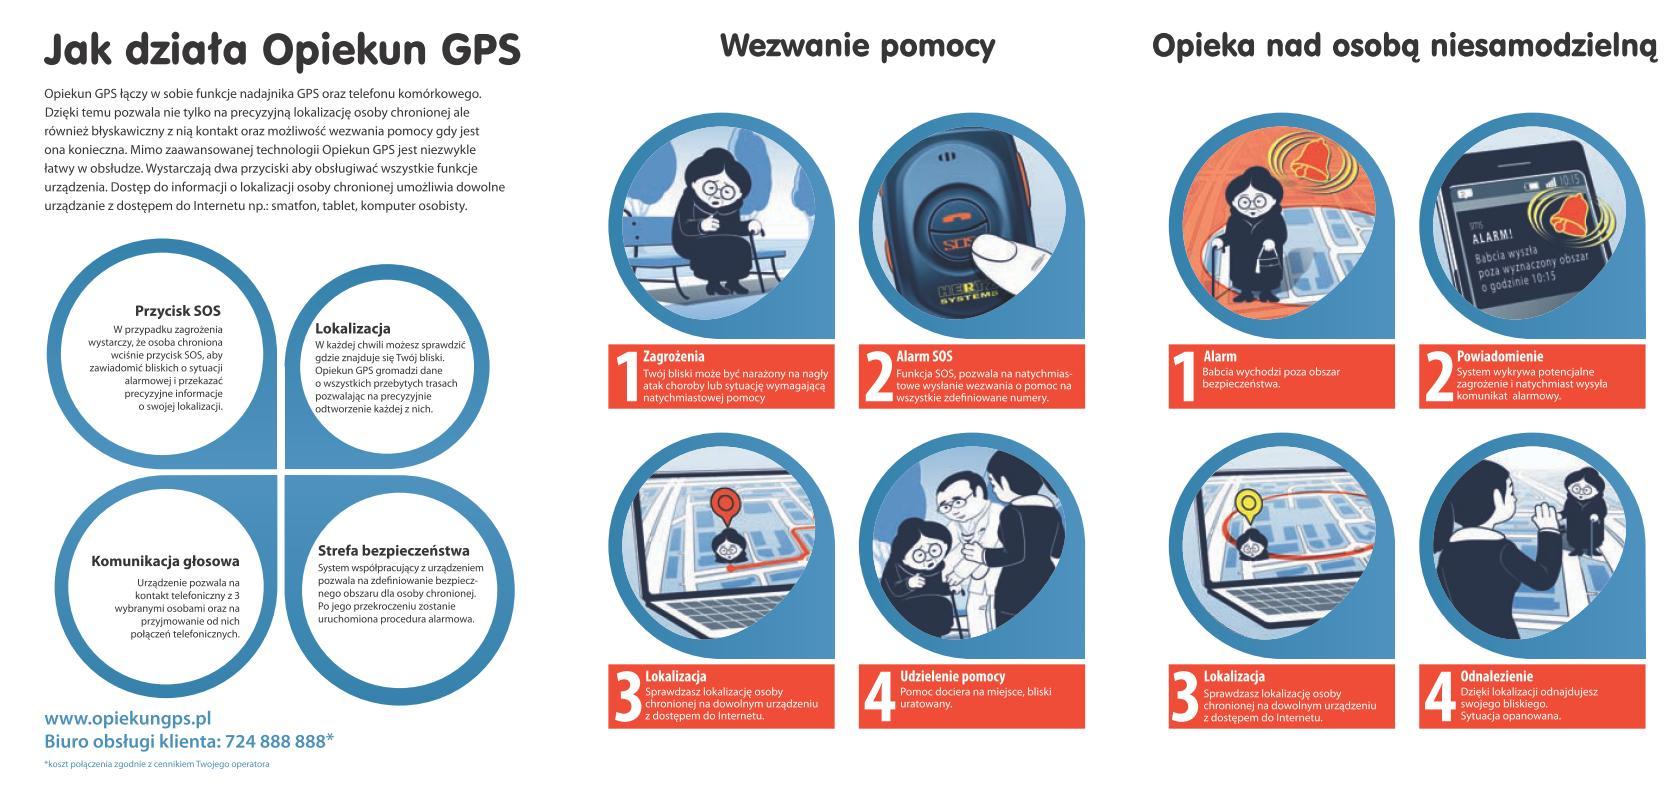 Ulotka_i_infografika_Opiekun GPS_02